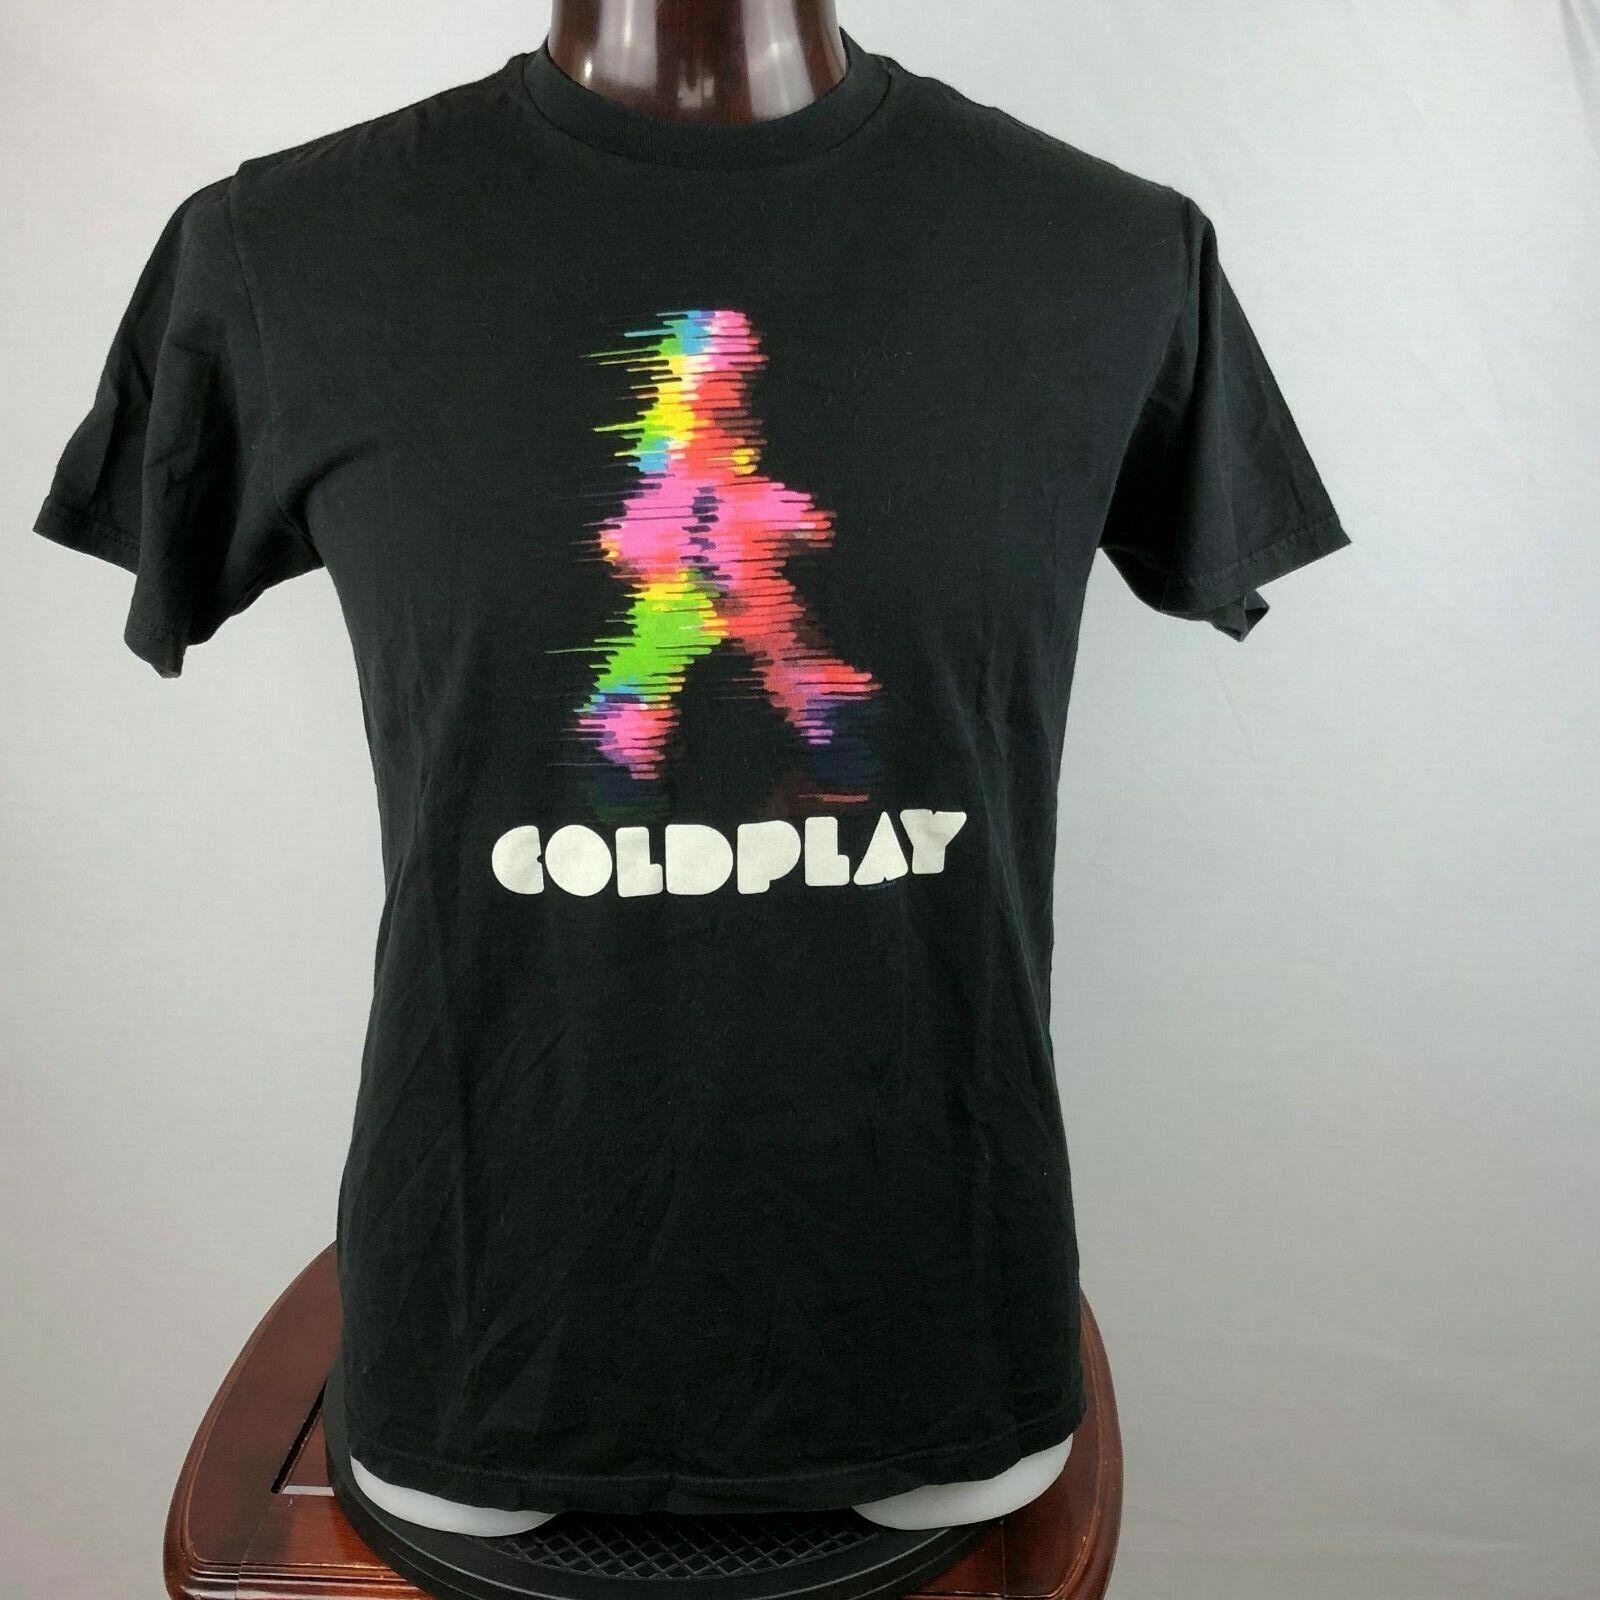 Coldplay Mens L Graphic T Shirt